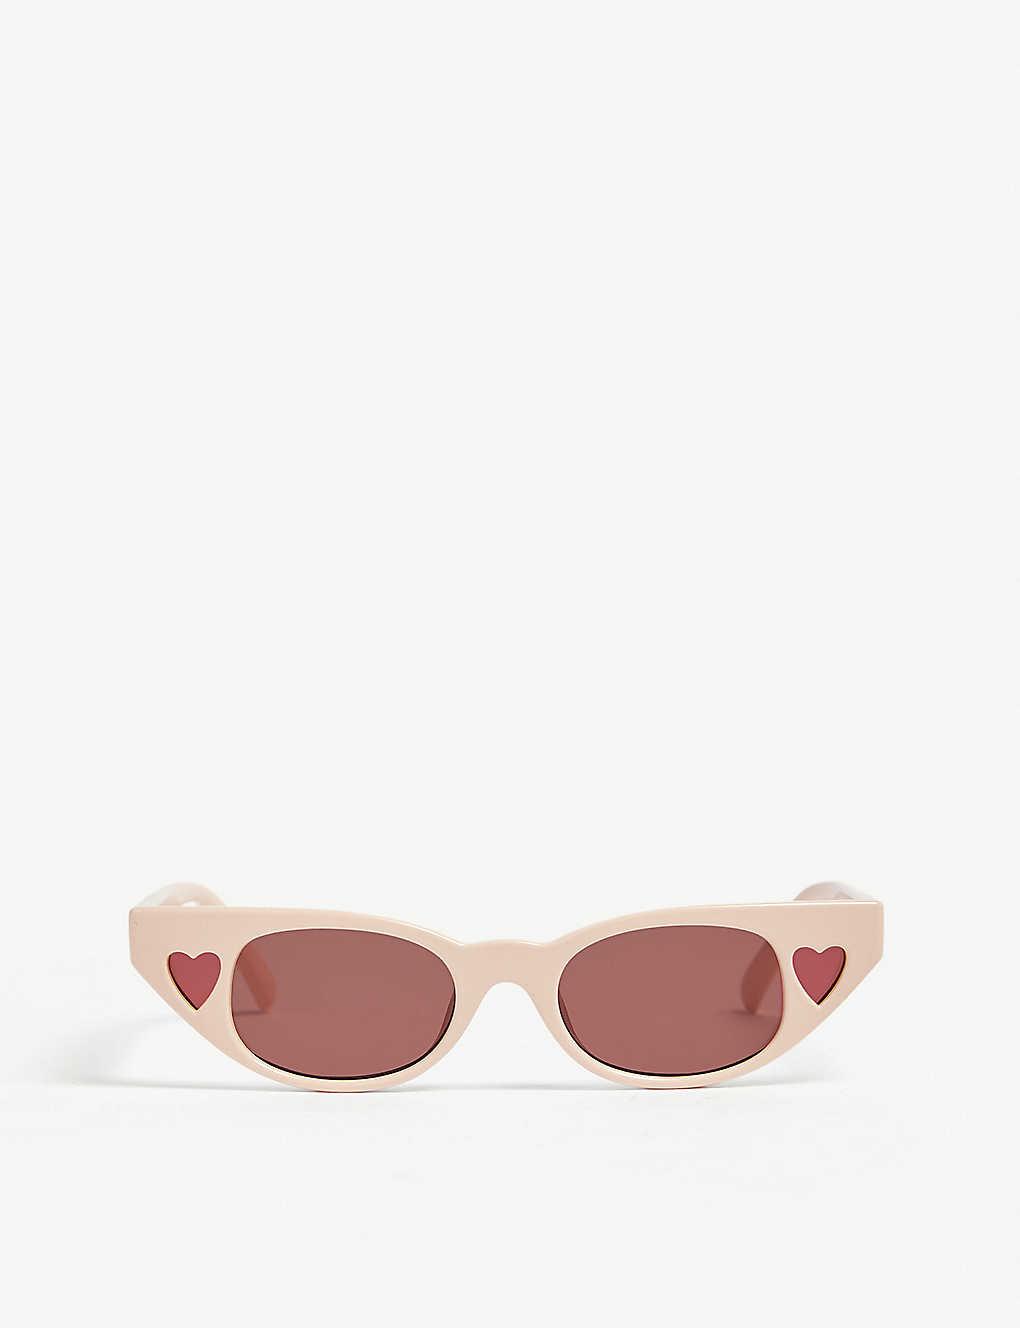 f18a08f99cfec LE SPECS - The Heartbreaker cat eye-frame sunglasses